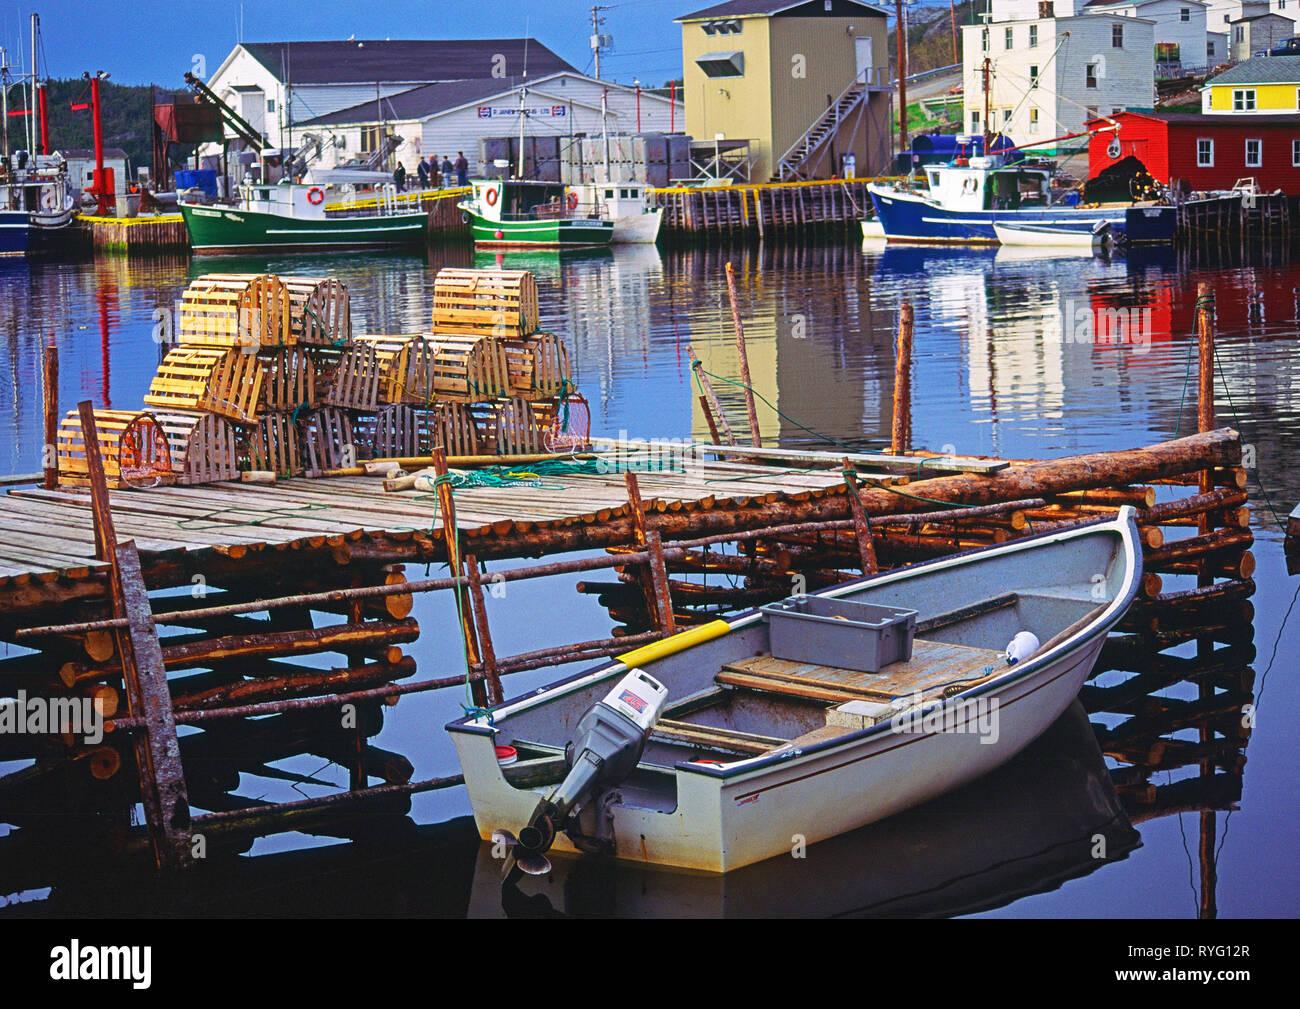 Village of Salvage, Newfoundland, Canada - Stock Image